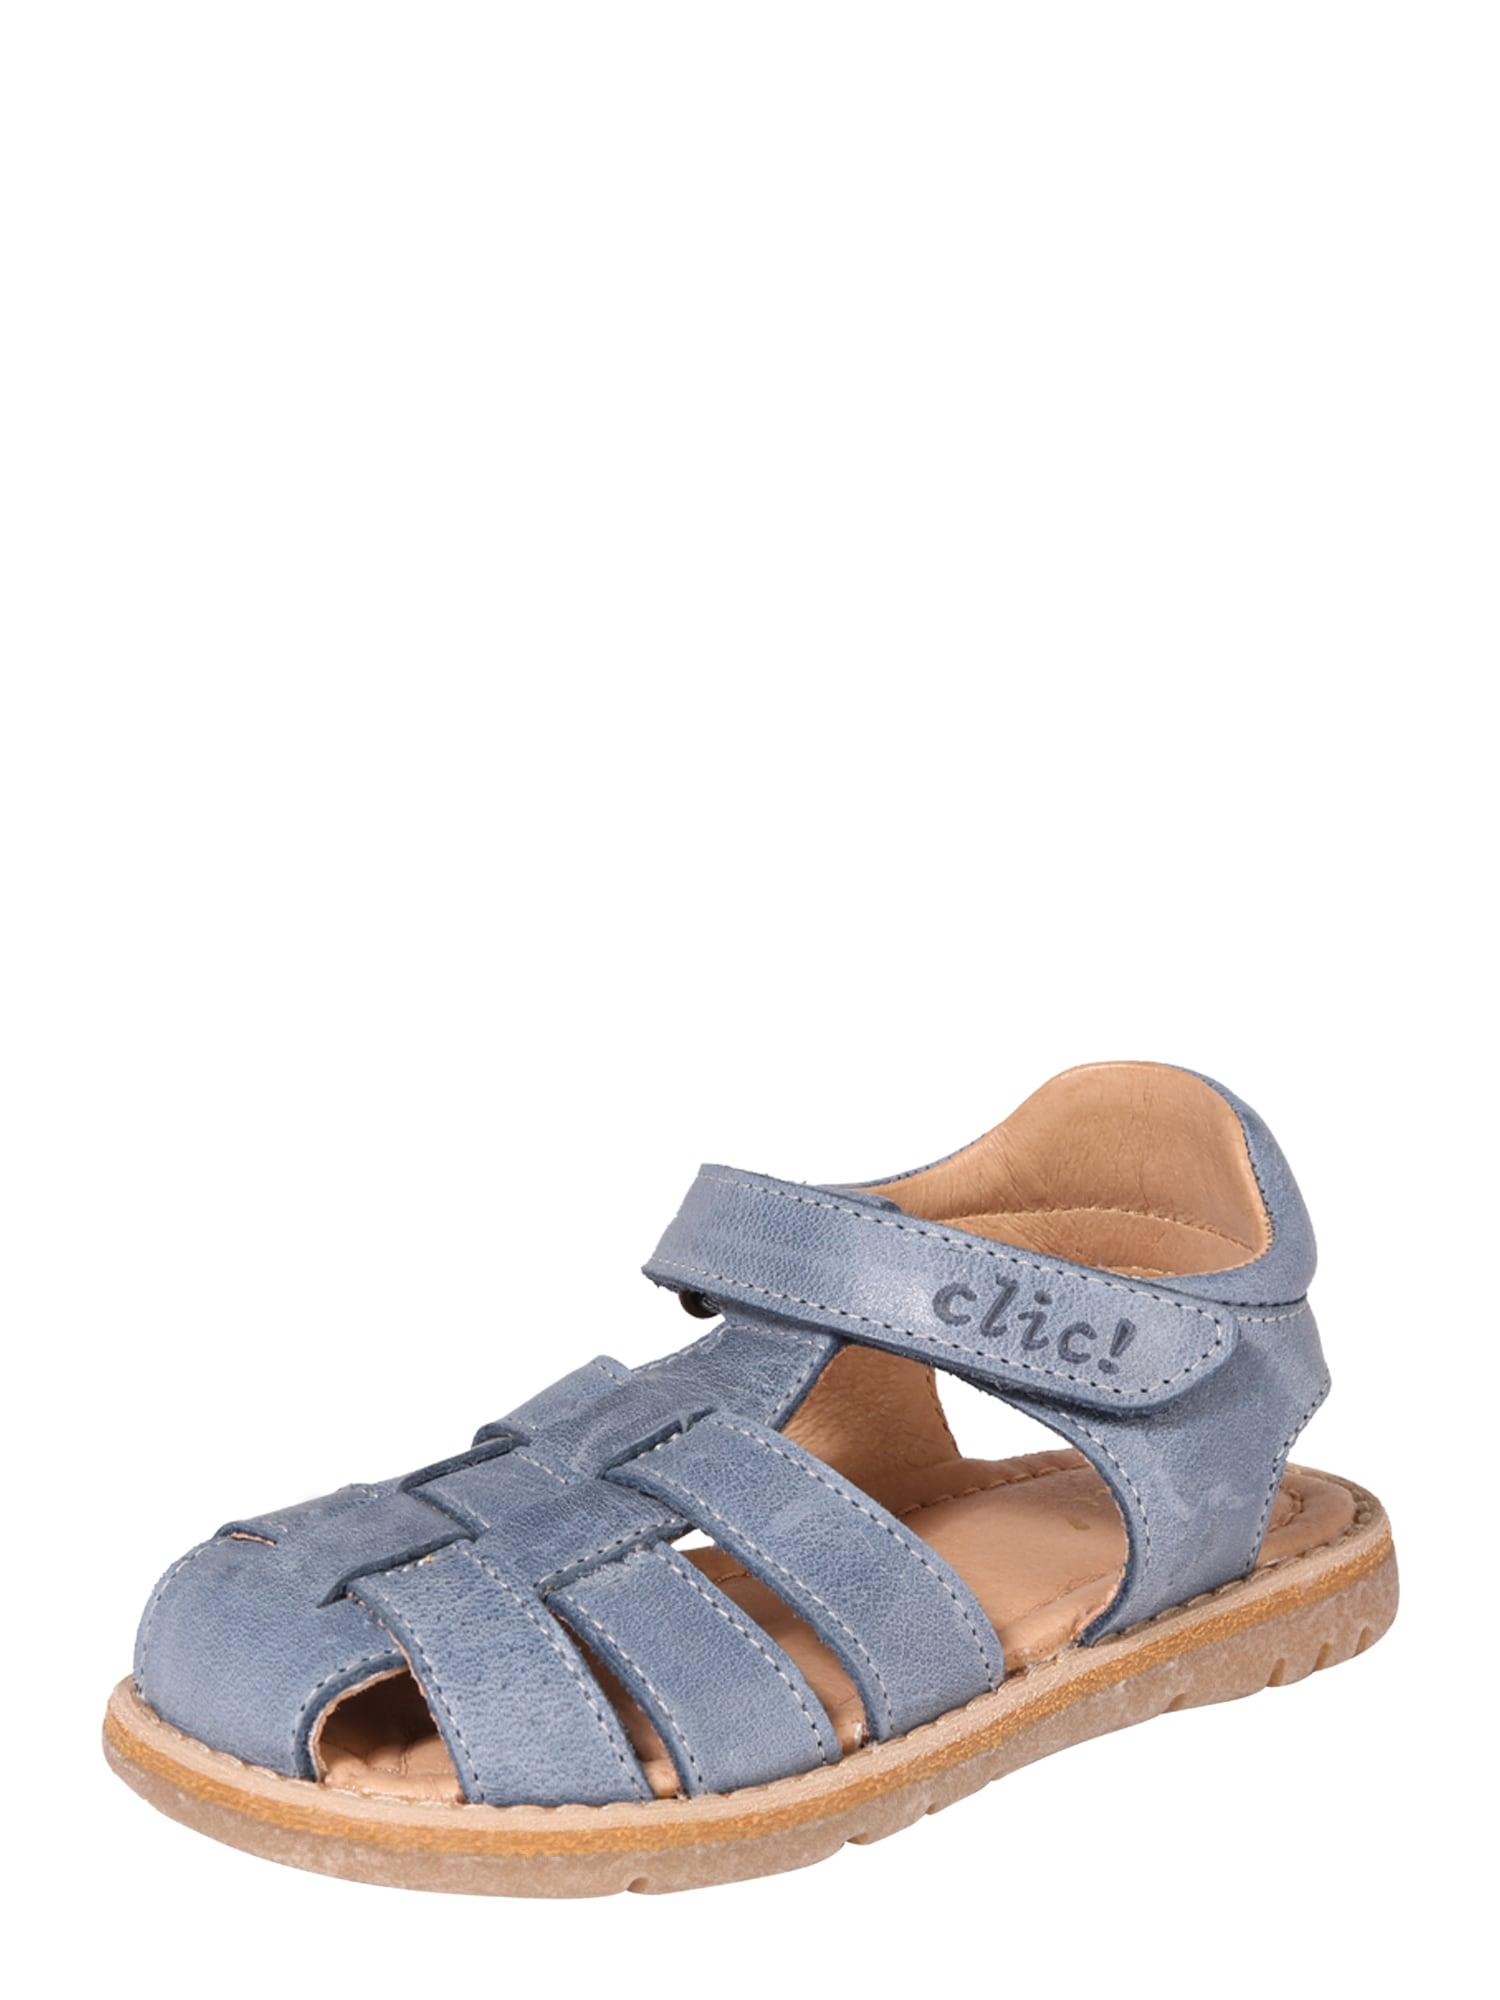 Sandály CL-8759 modrá Clic